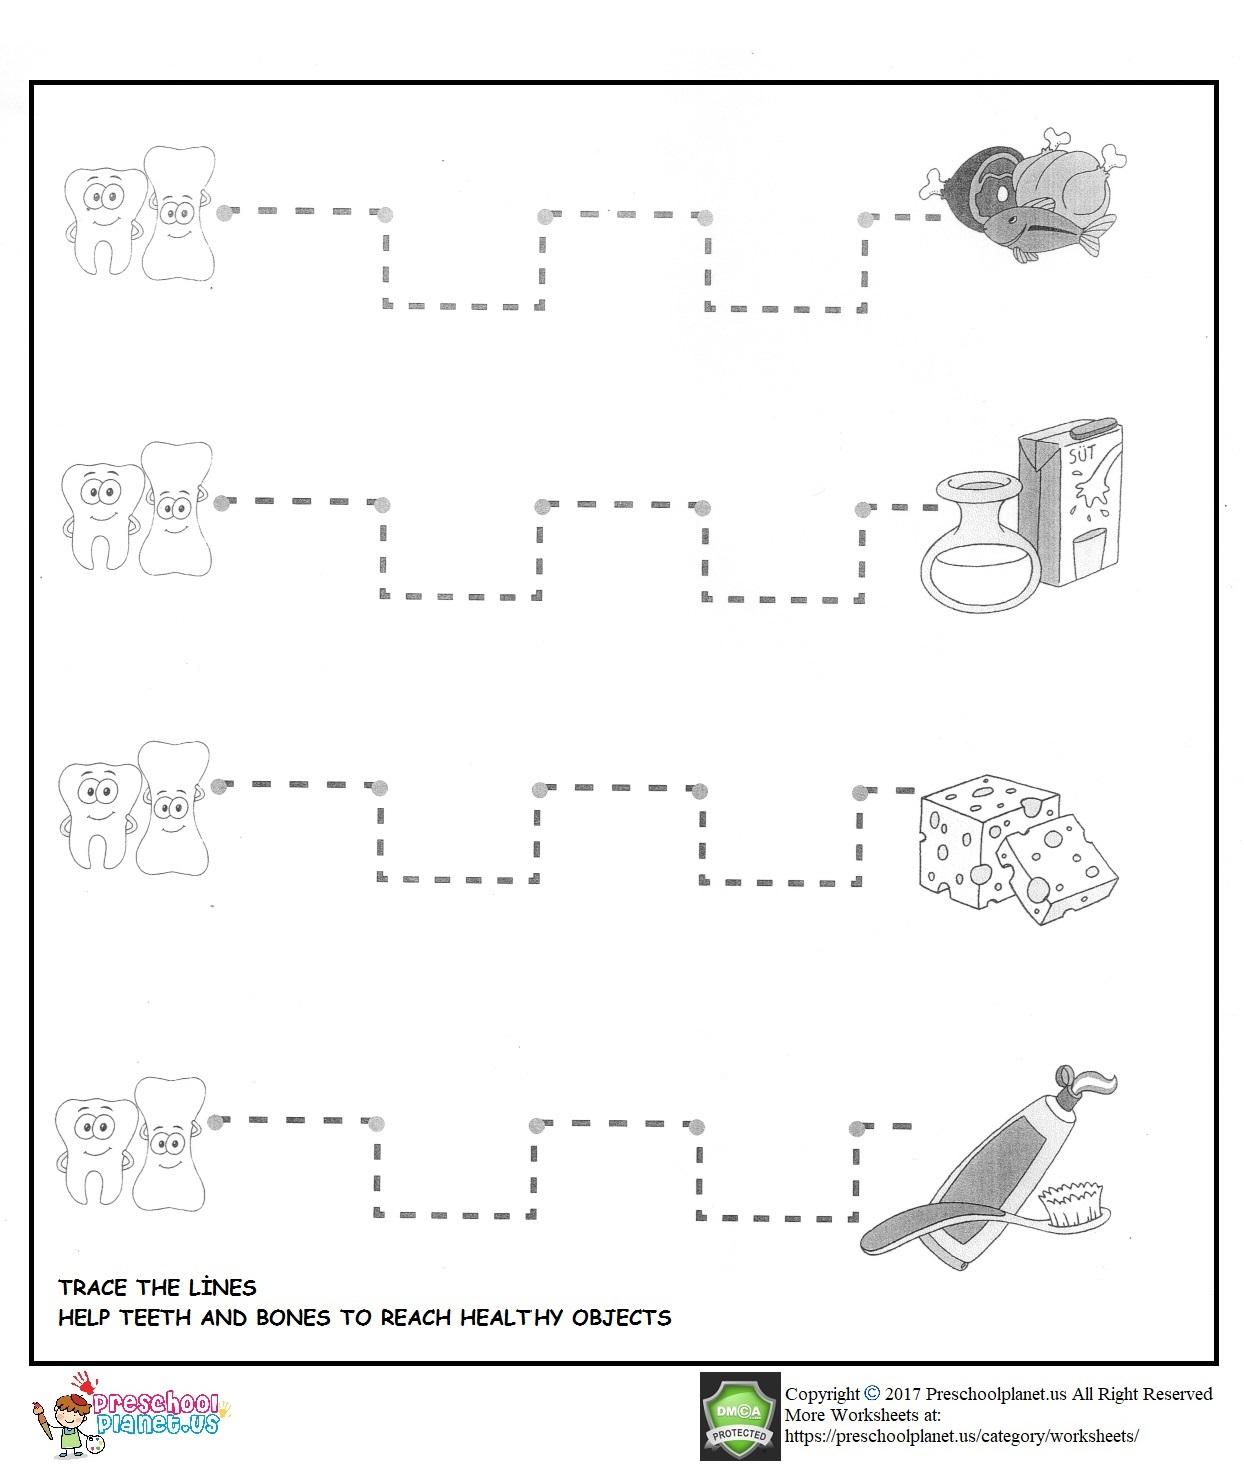 Dental Health Worksheet For Kids Preschoolplanet